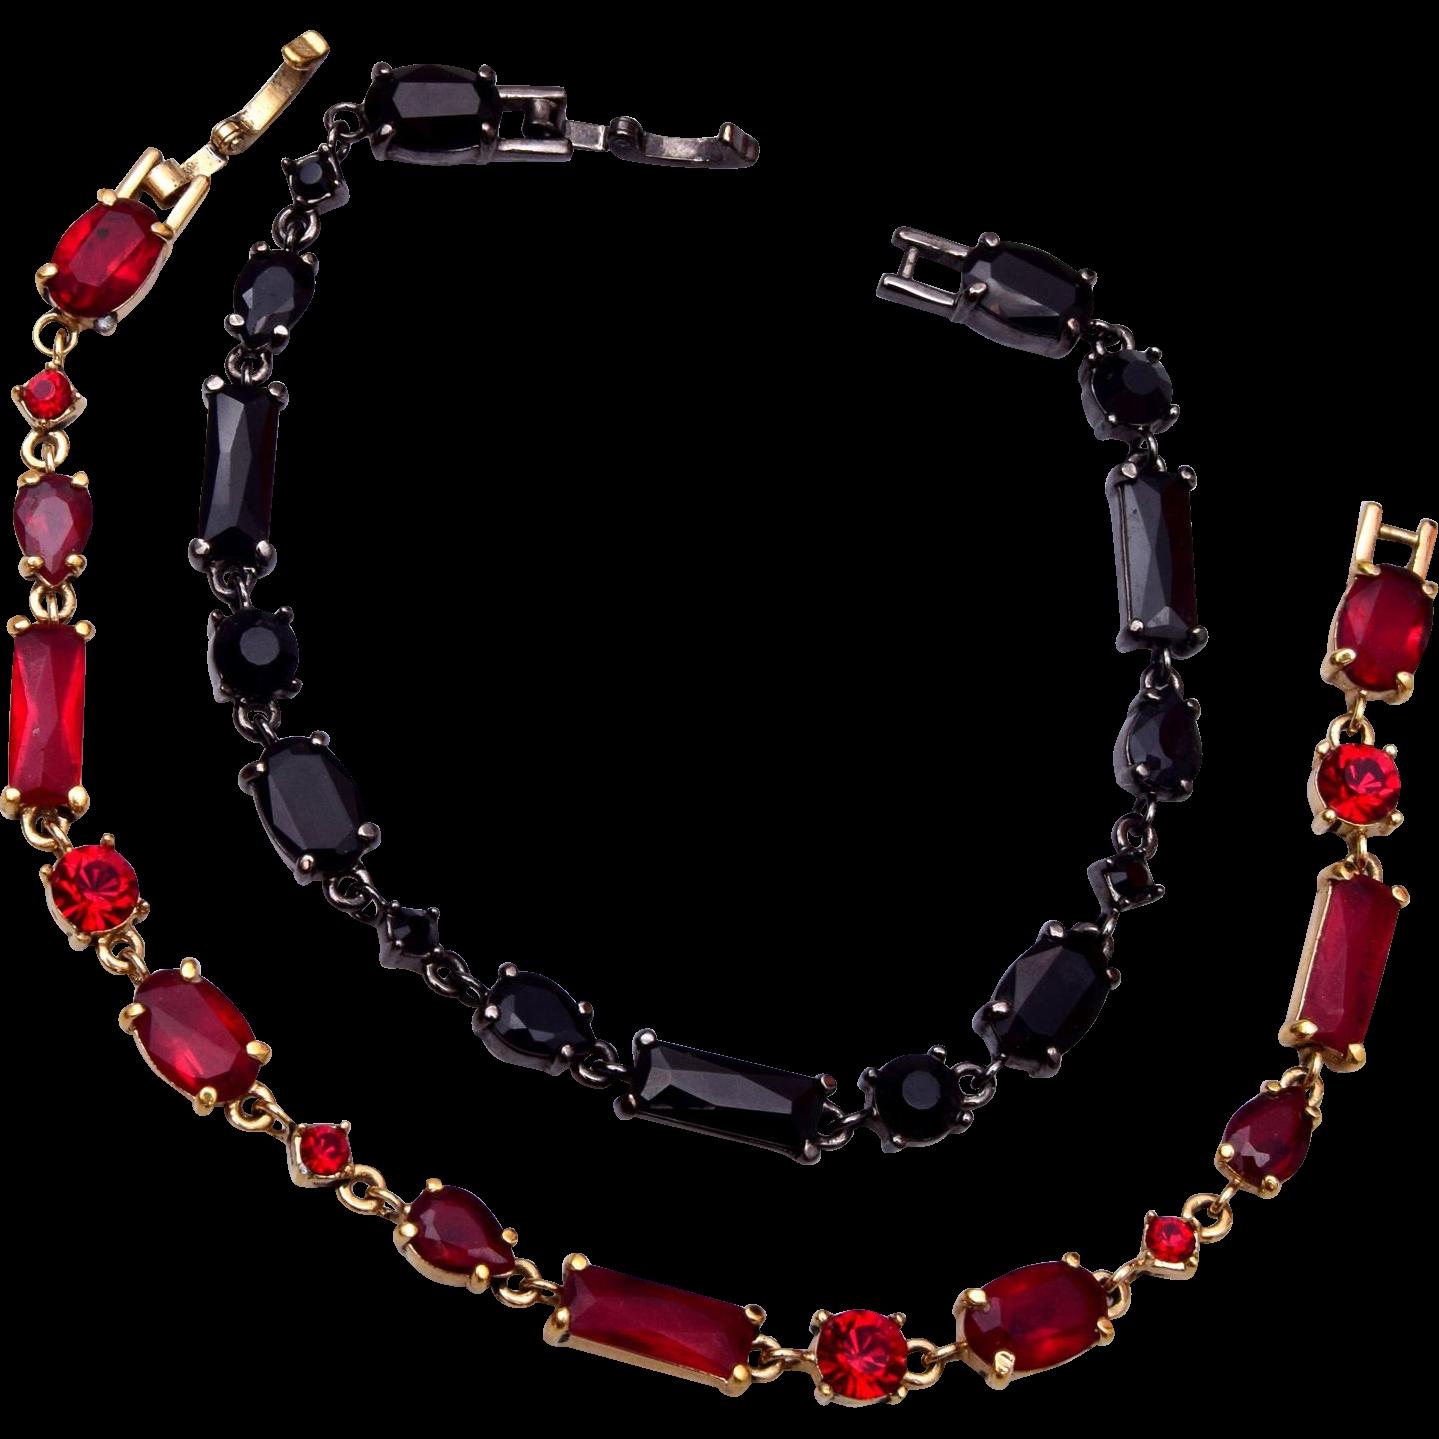 Liz Claiborne Bracelet Pair - Red and Black